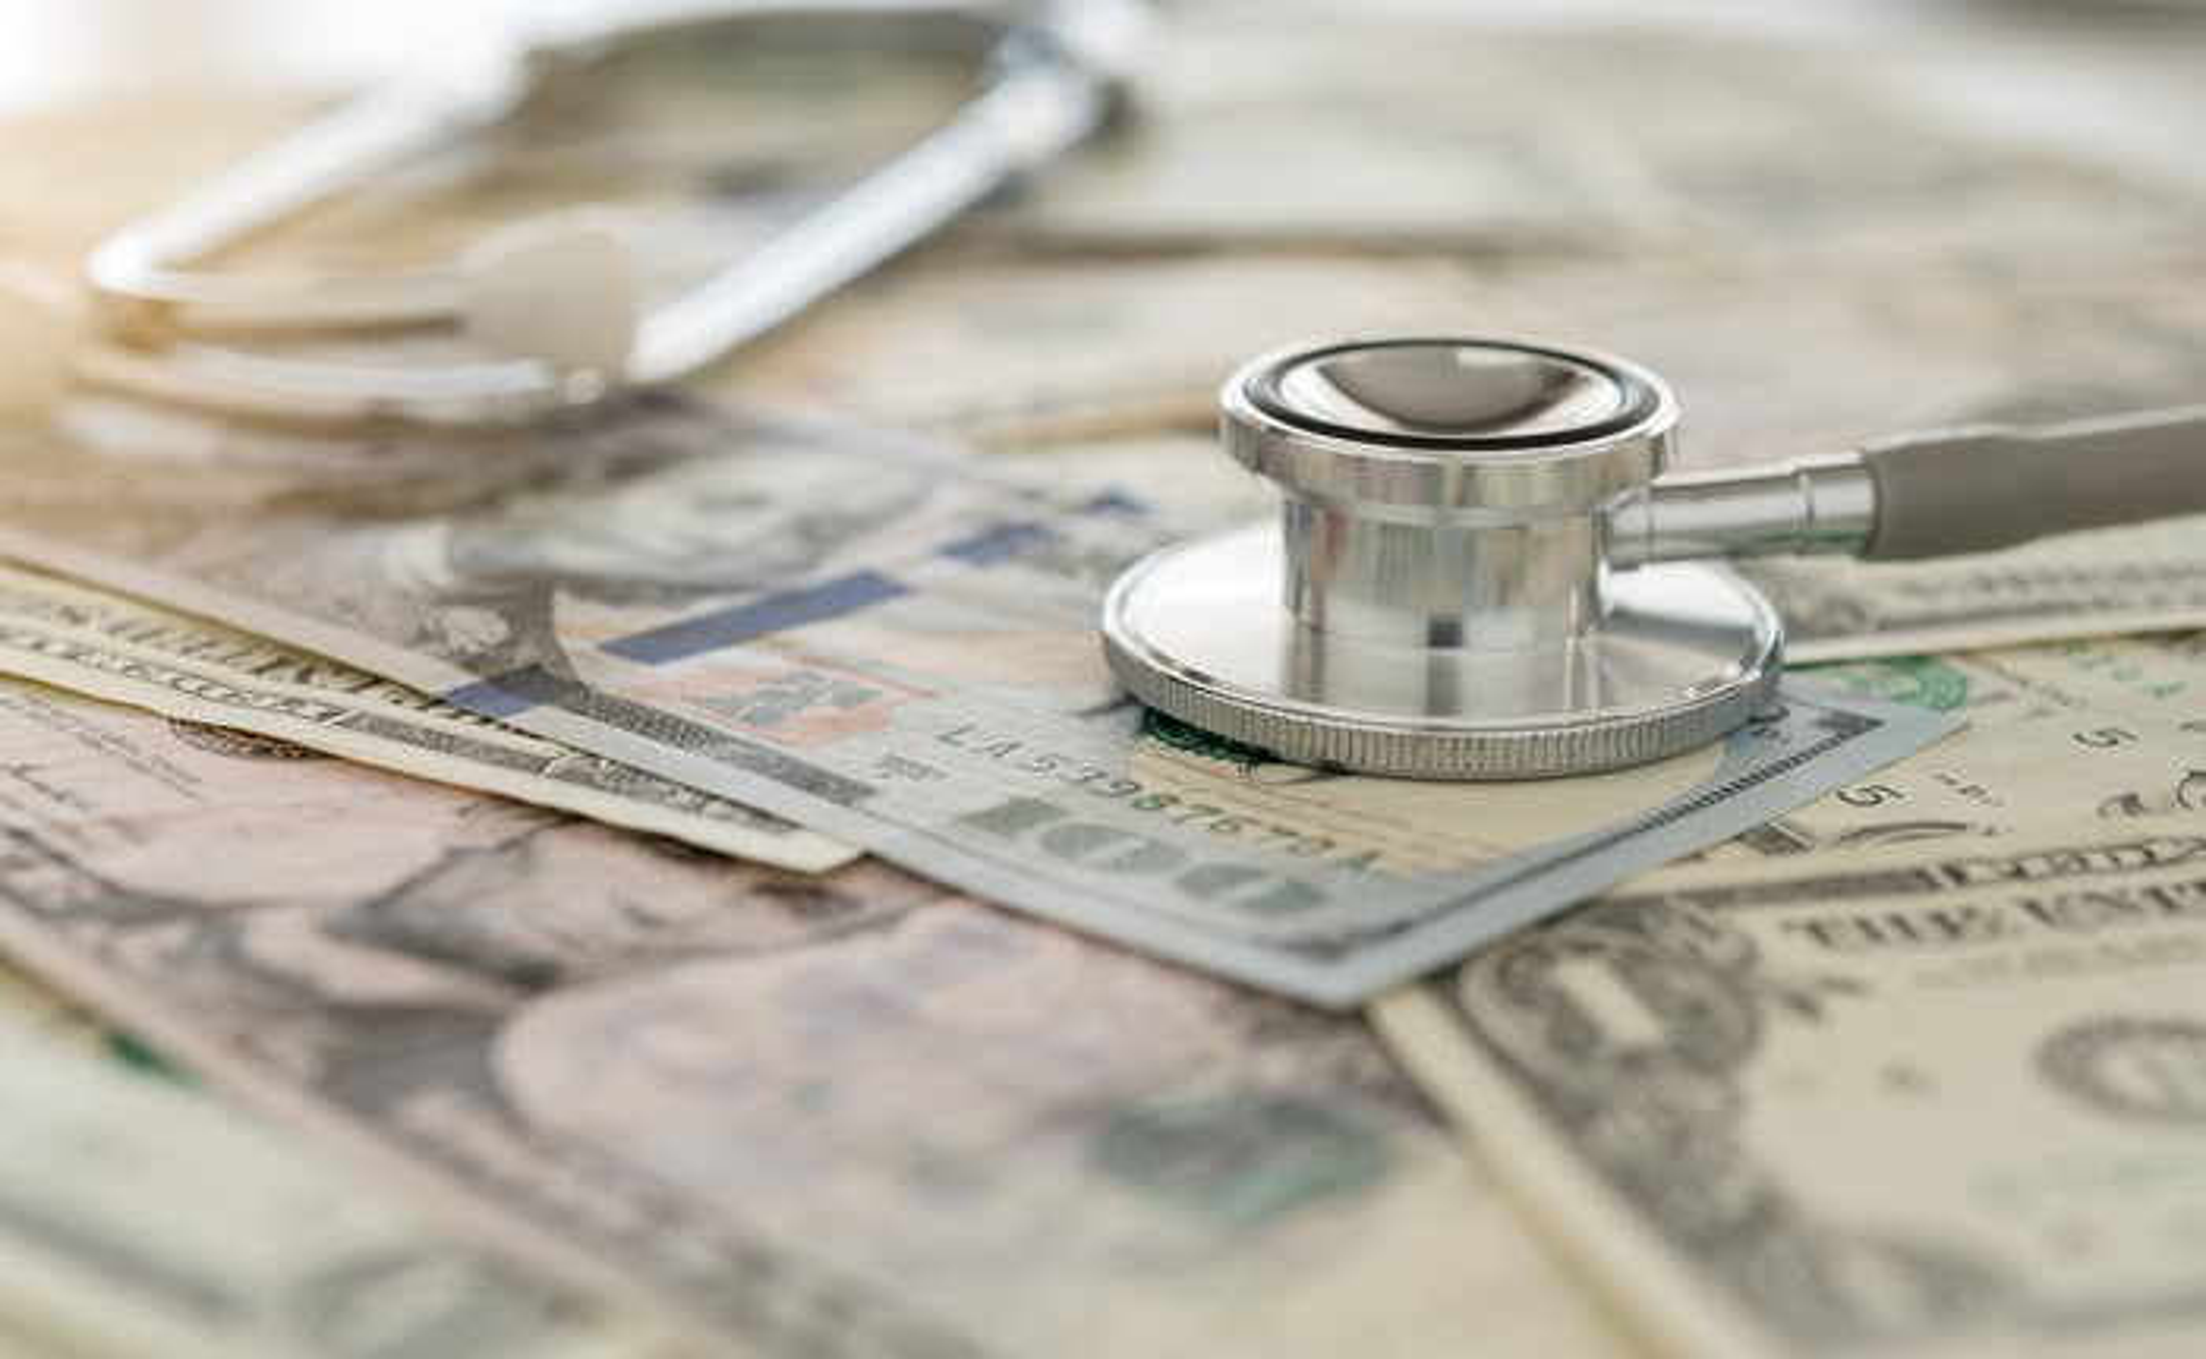 Stethoscope on top of money